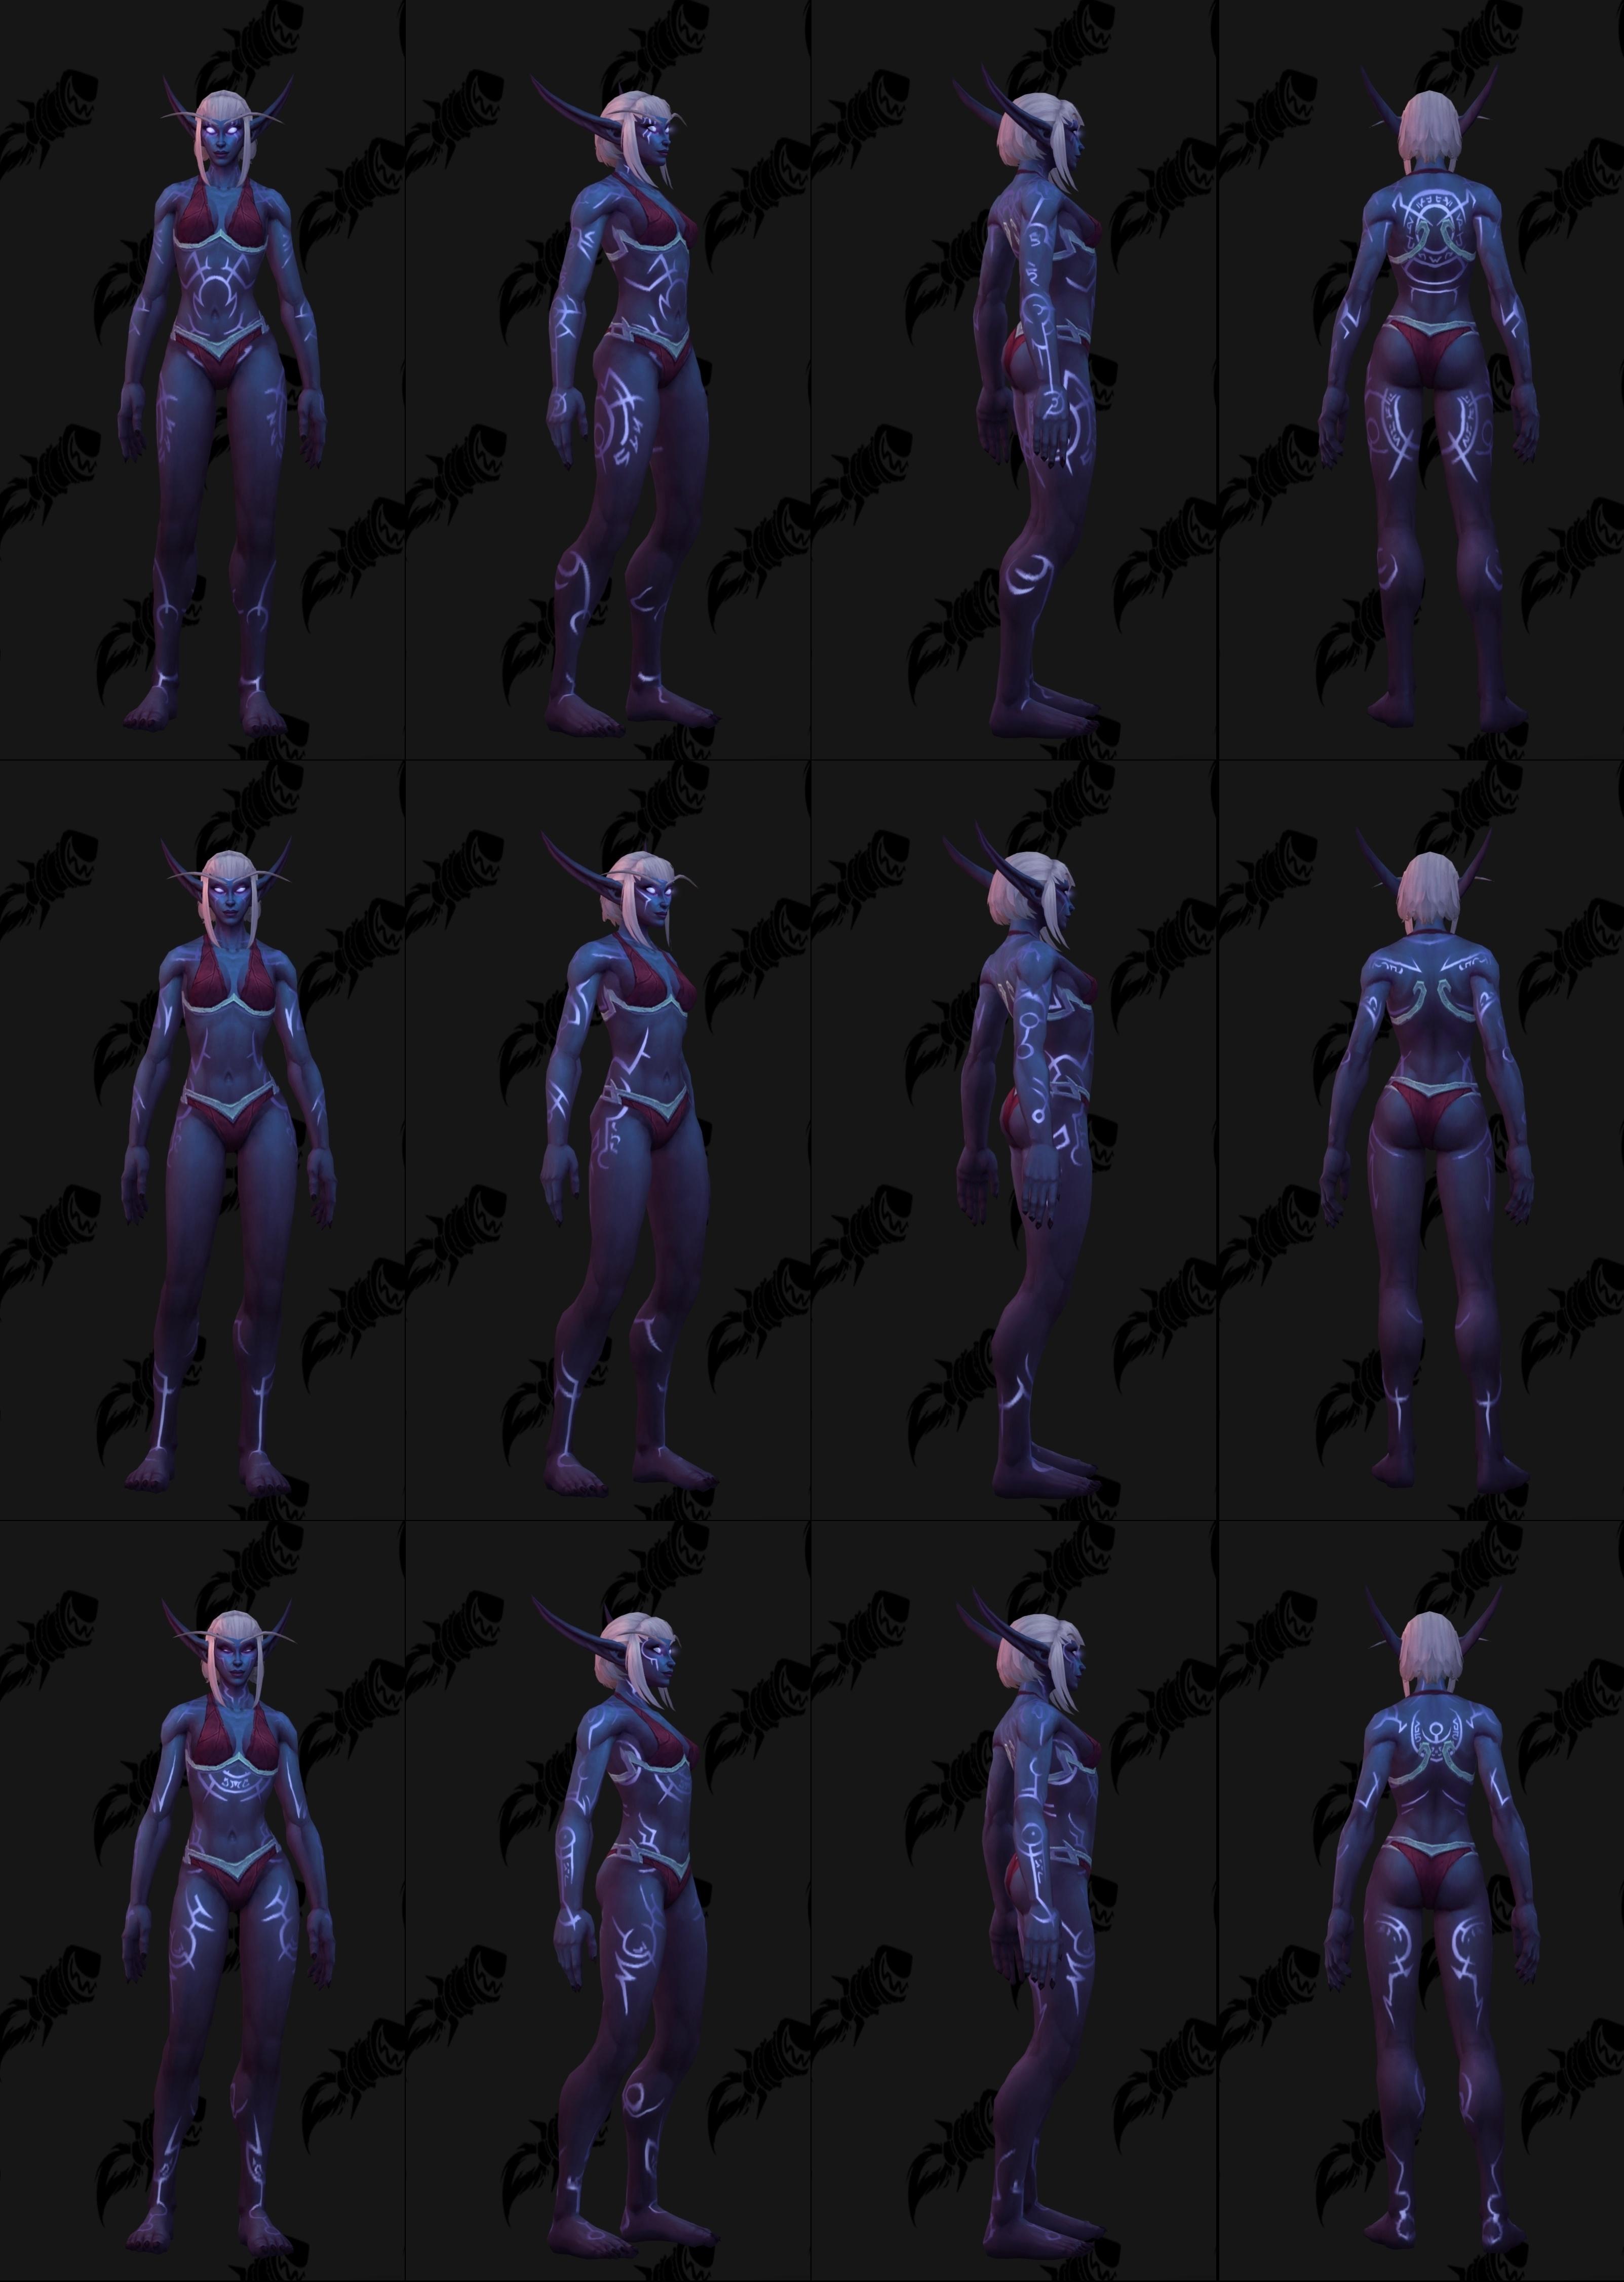 Nightborne Male and Female Allied Race Customization Options